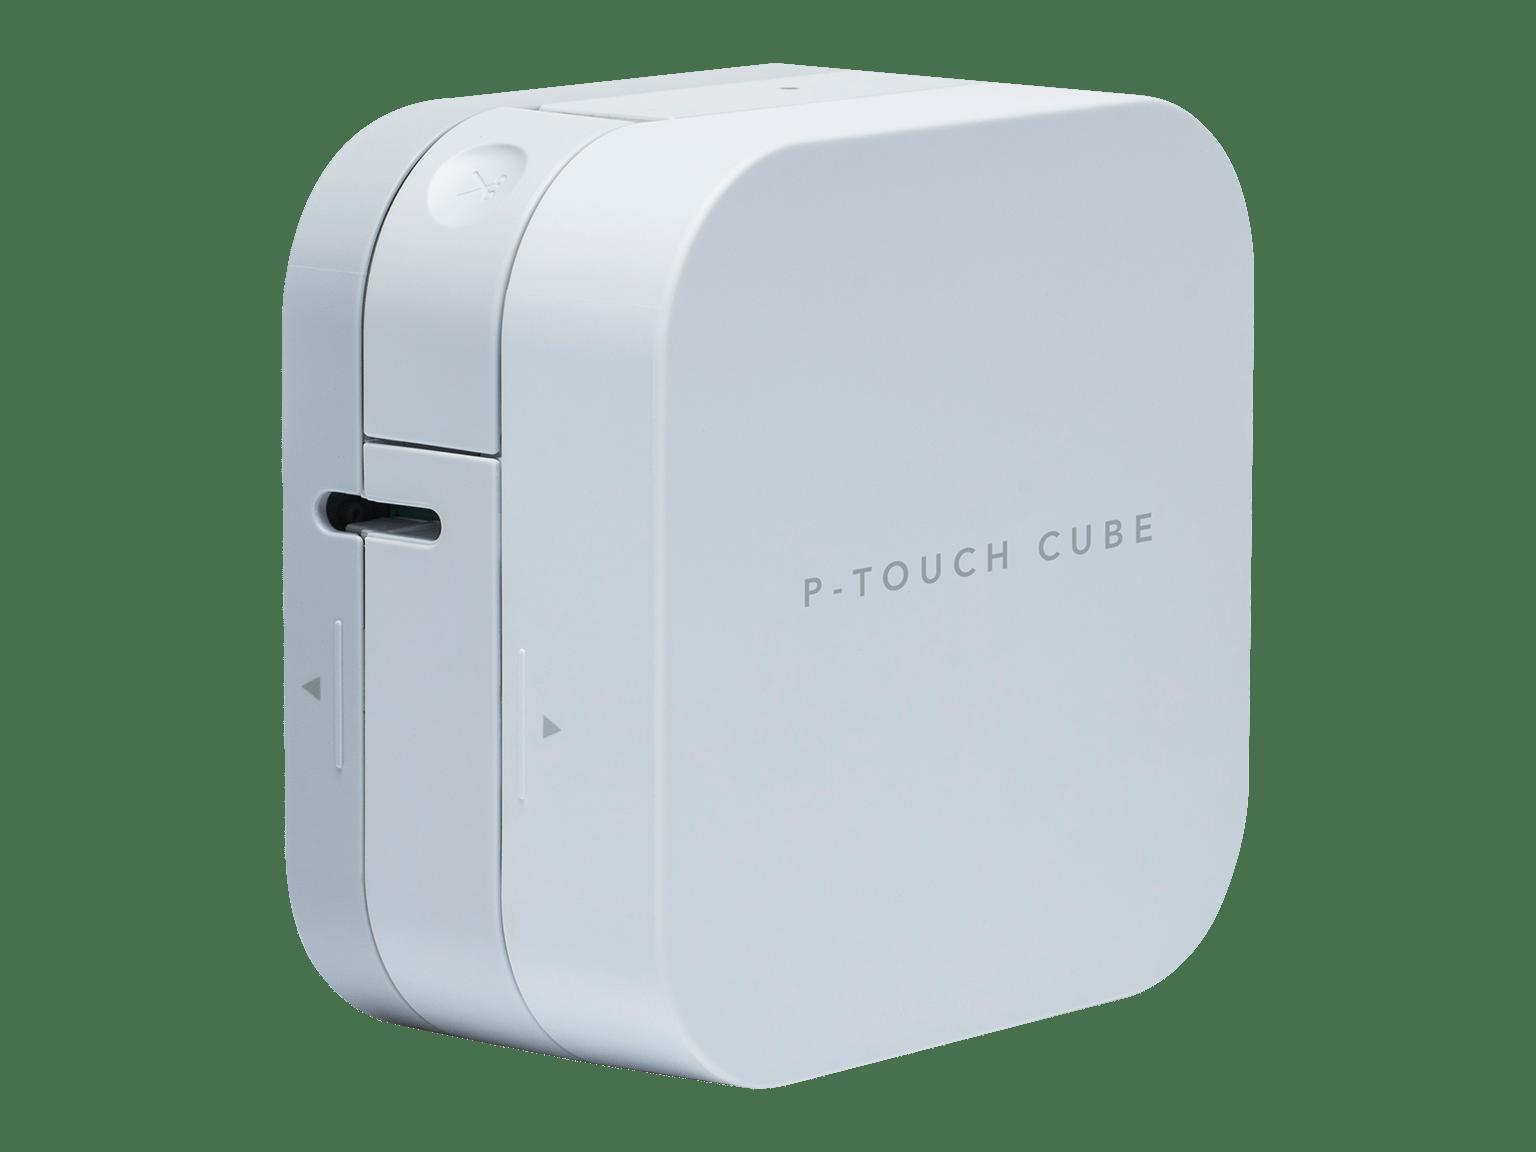 Brother P-touch CUBE P300BT етикетен принтер с Bluetooth